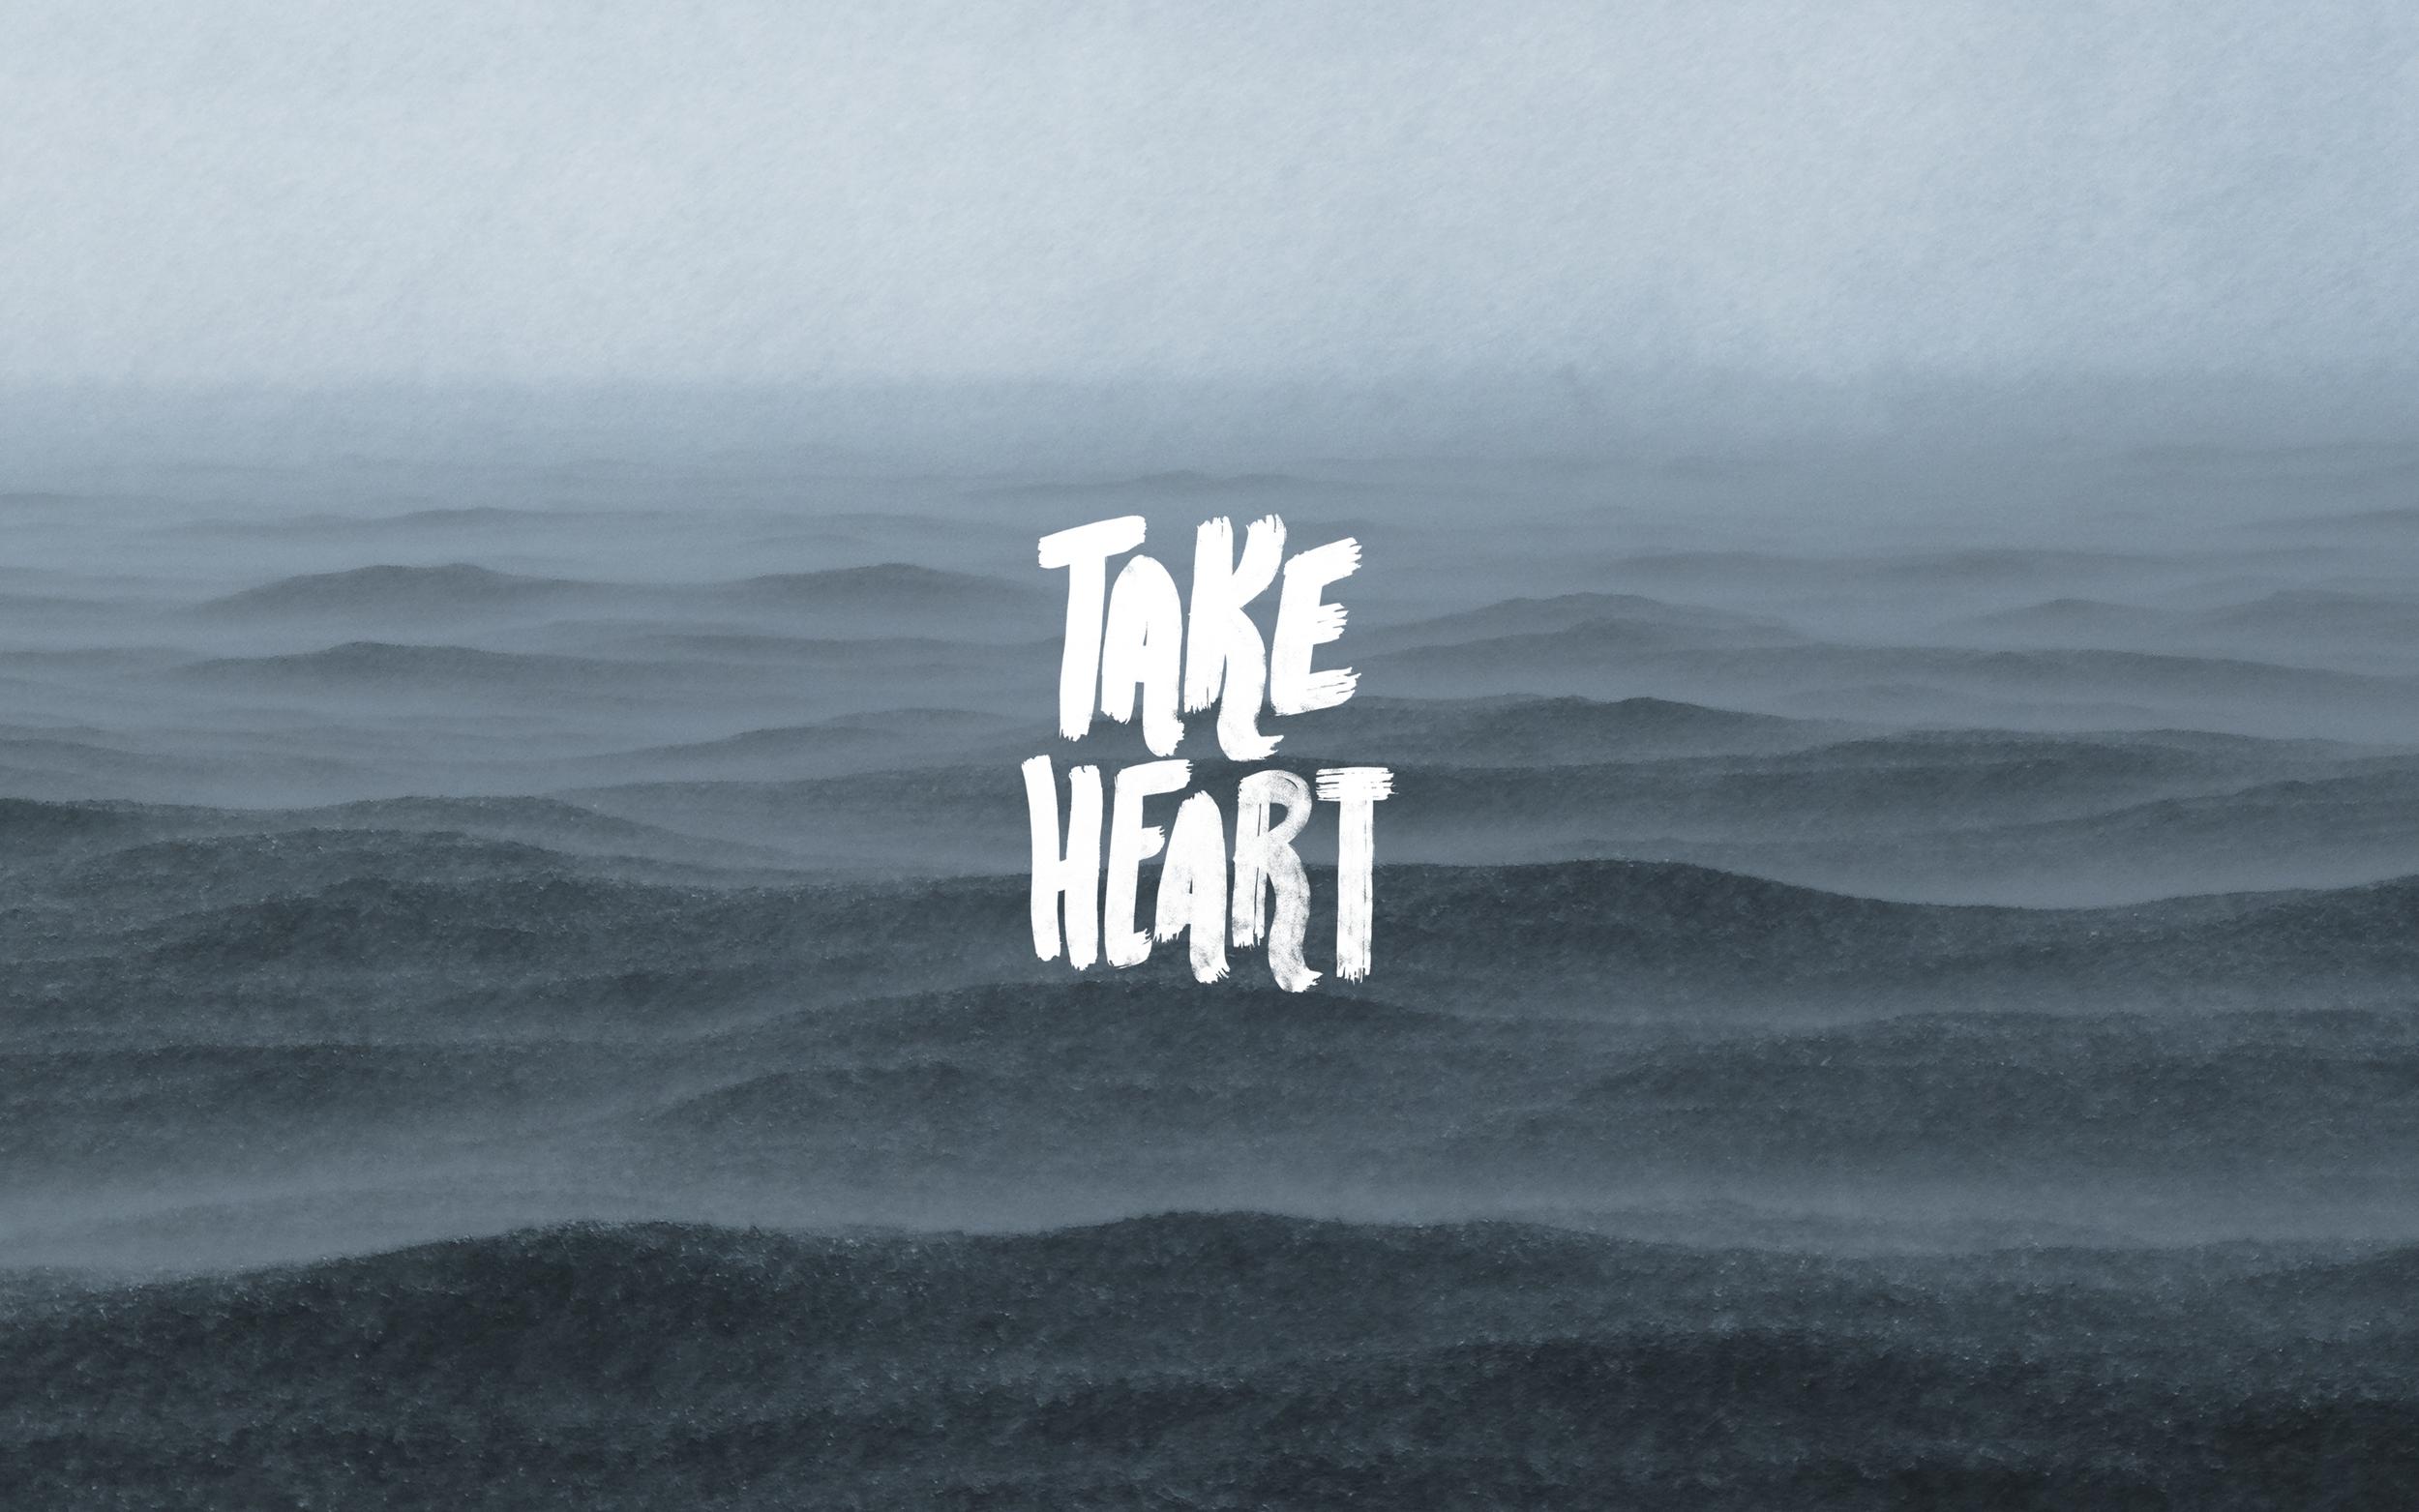 Take-Heart-Mackbook-Wallpaper.png